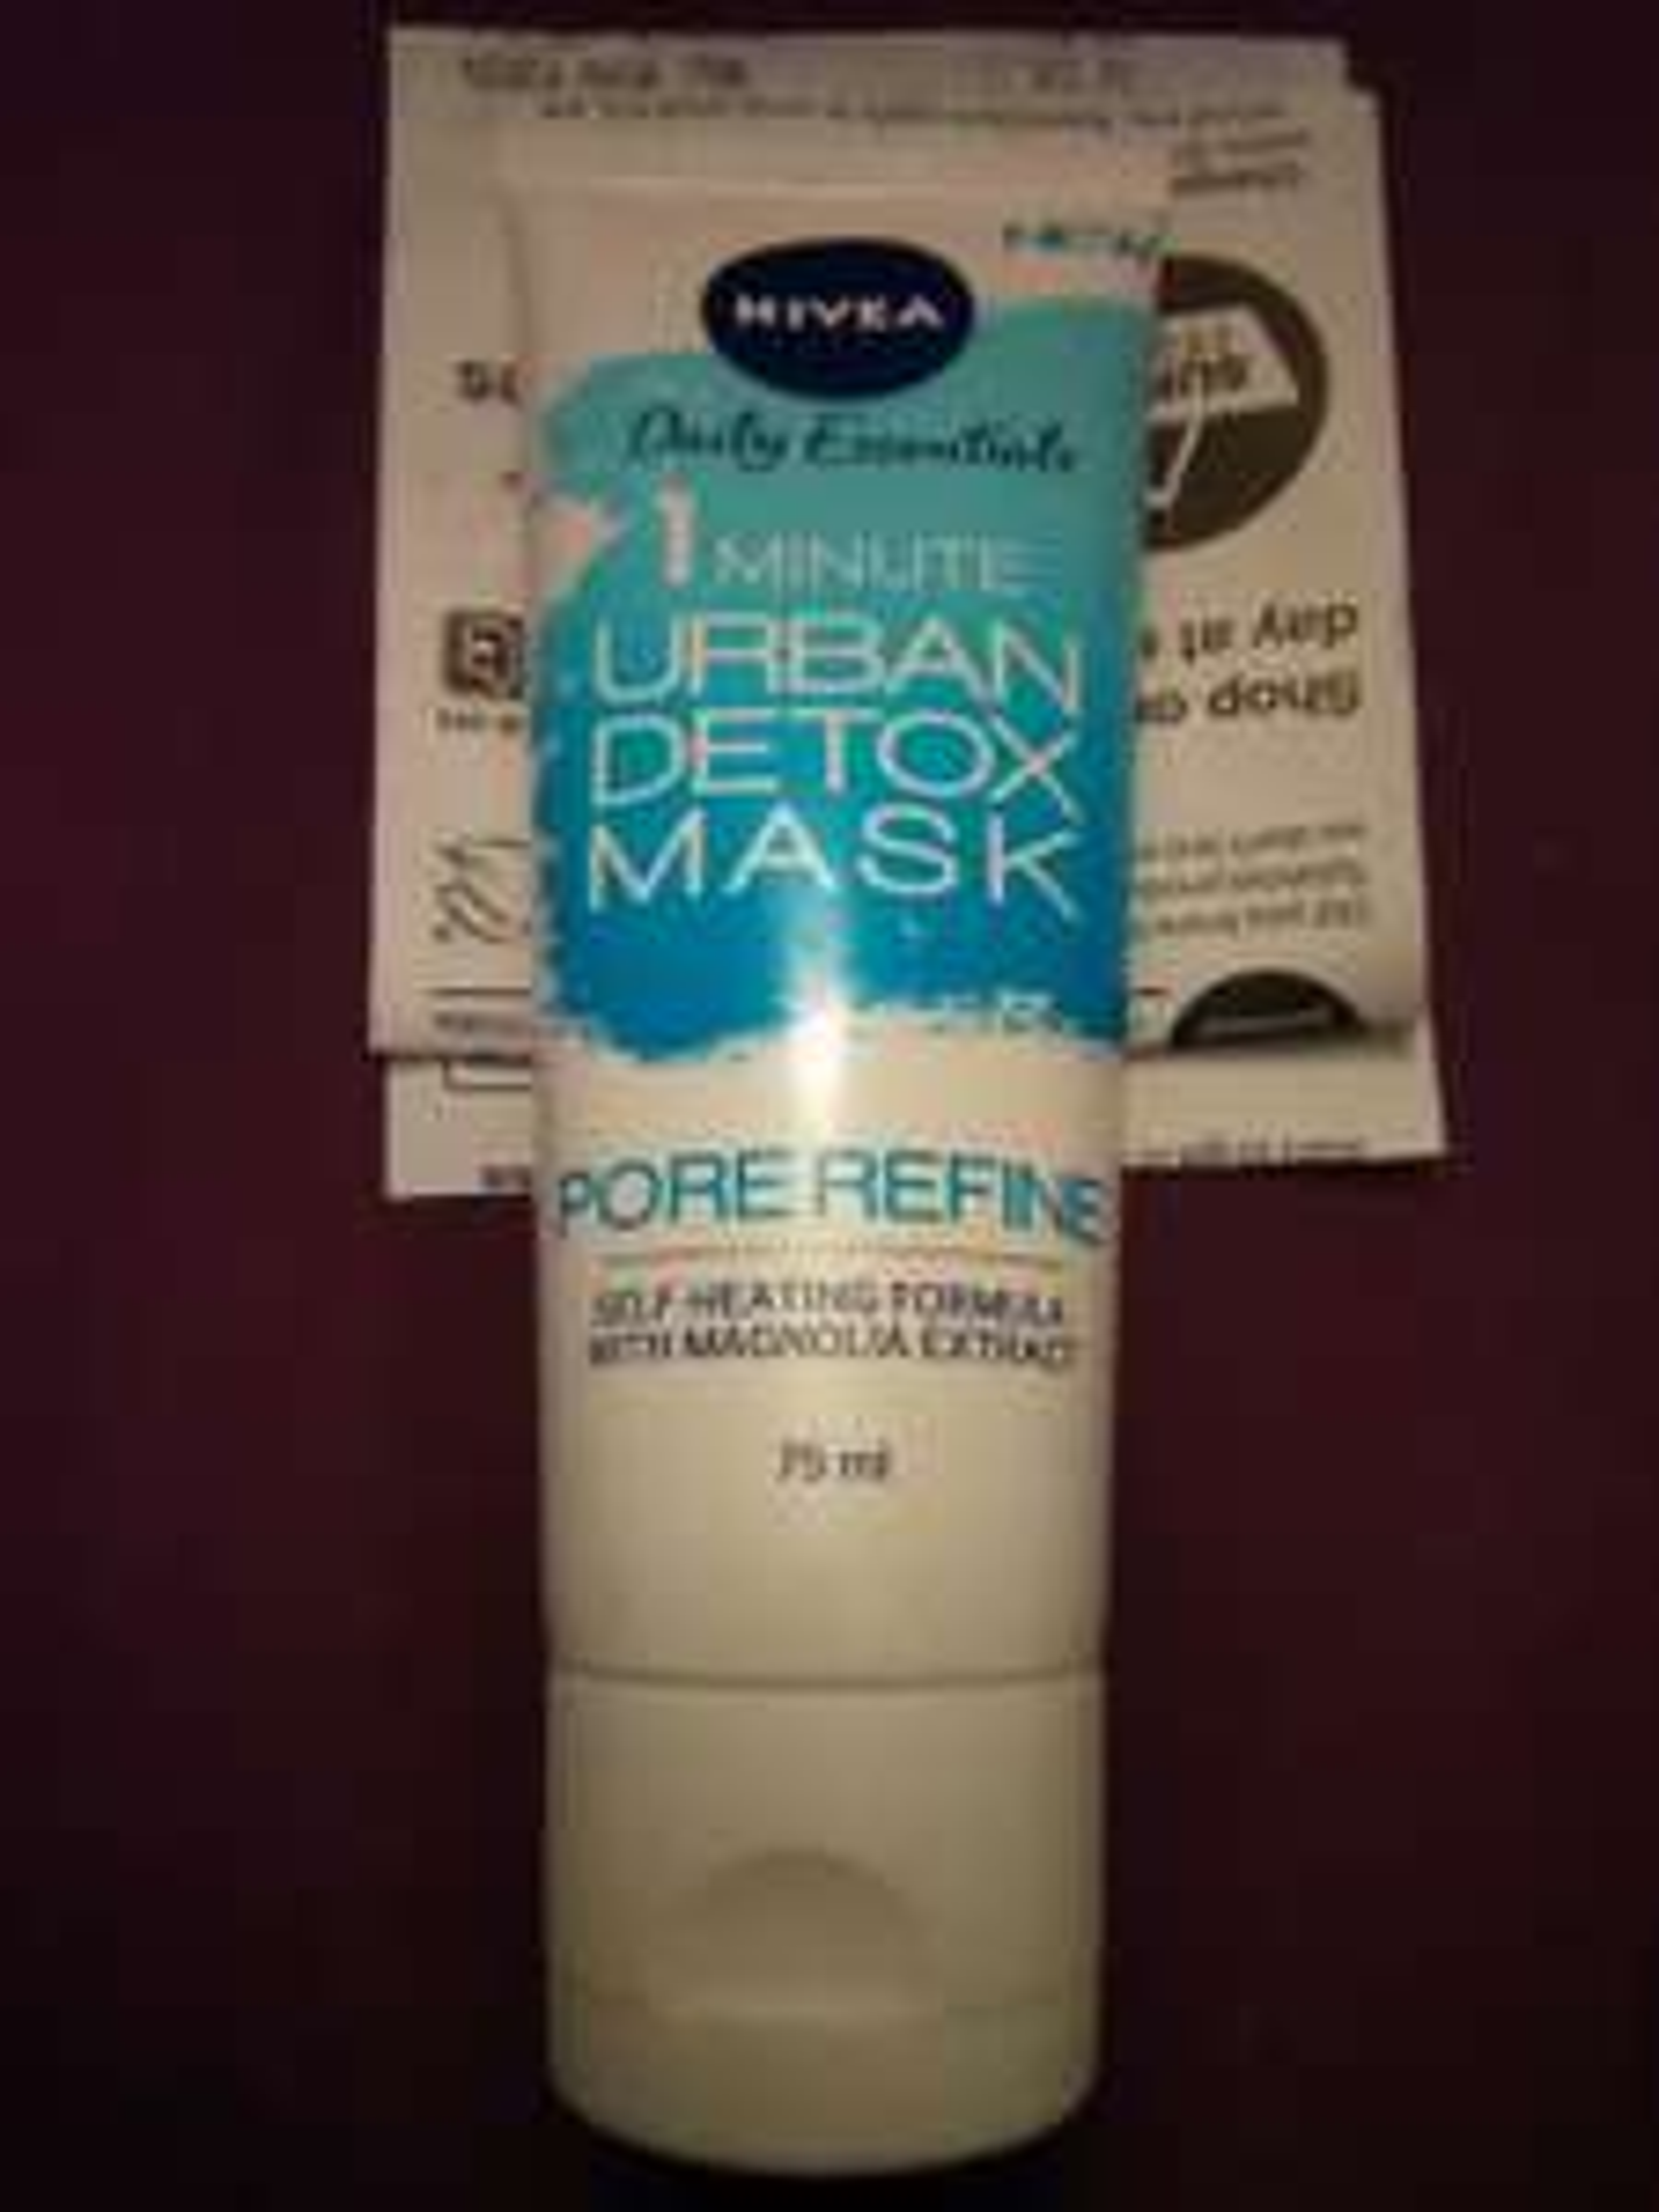 Nivea 1 minute urban detox pore refine mask and other varieties 70p in Superdrug